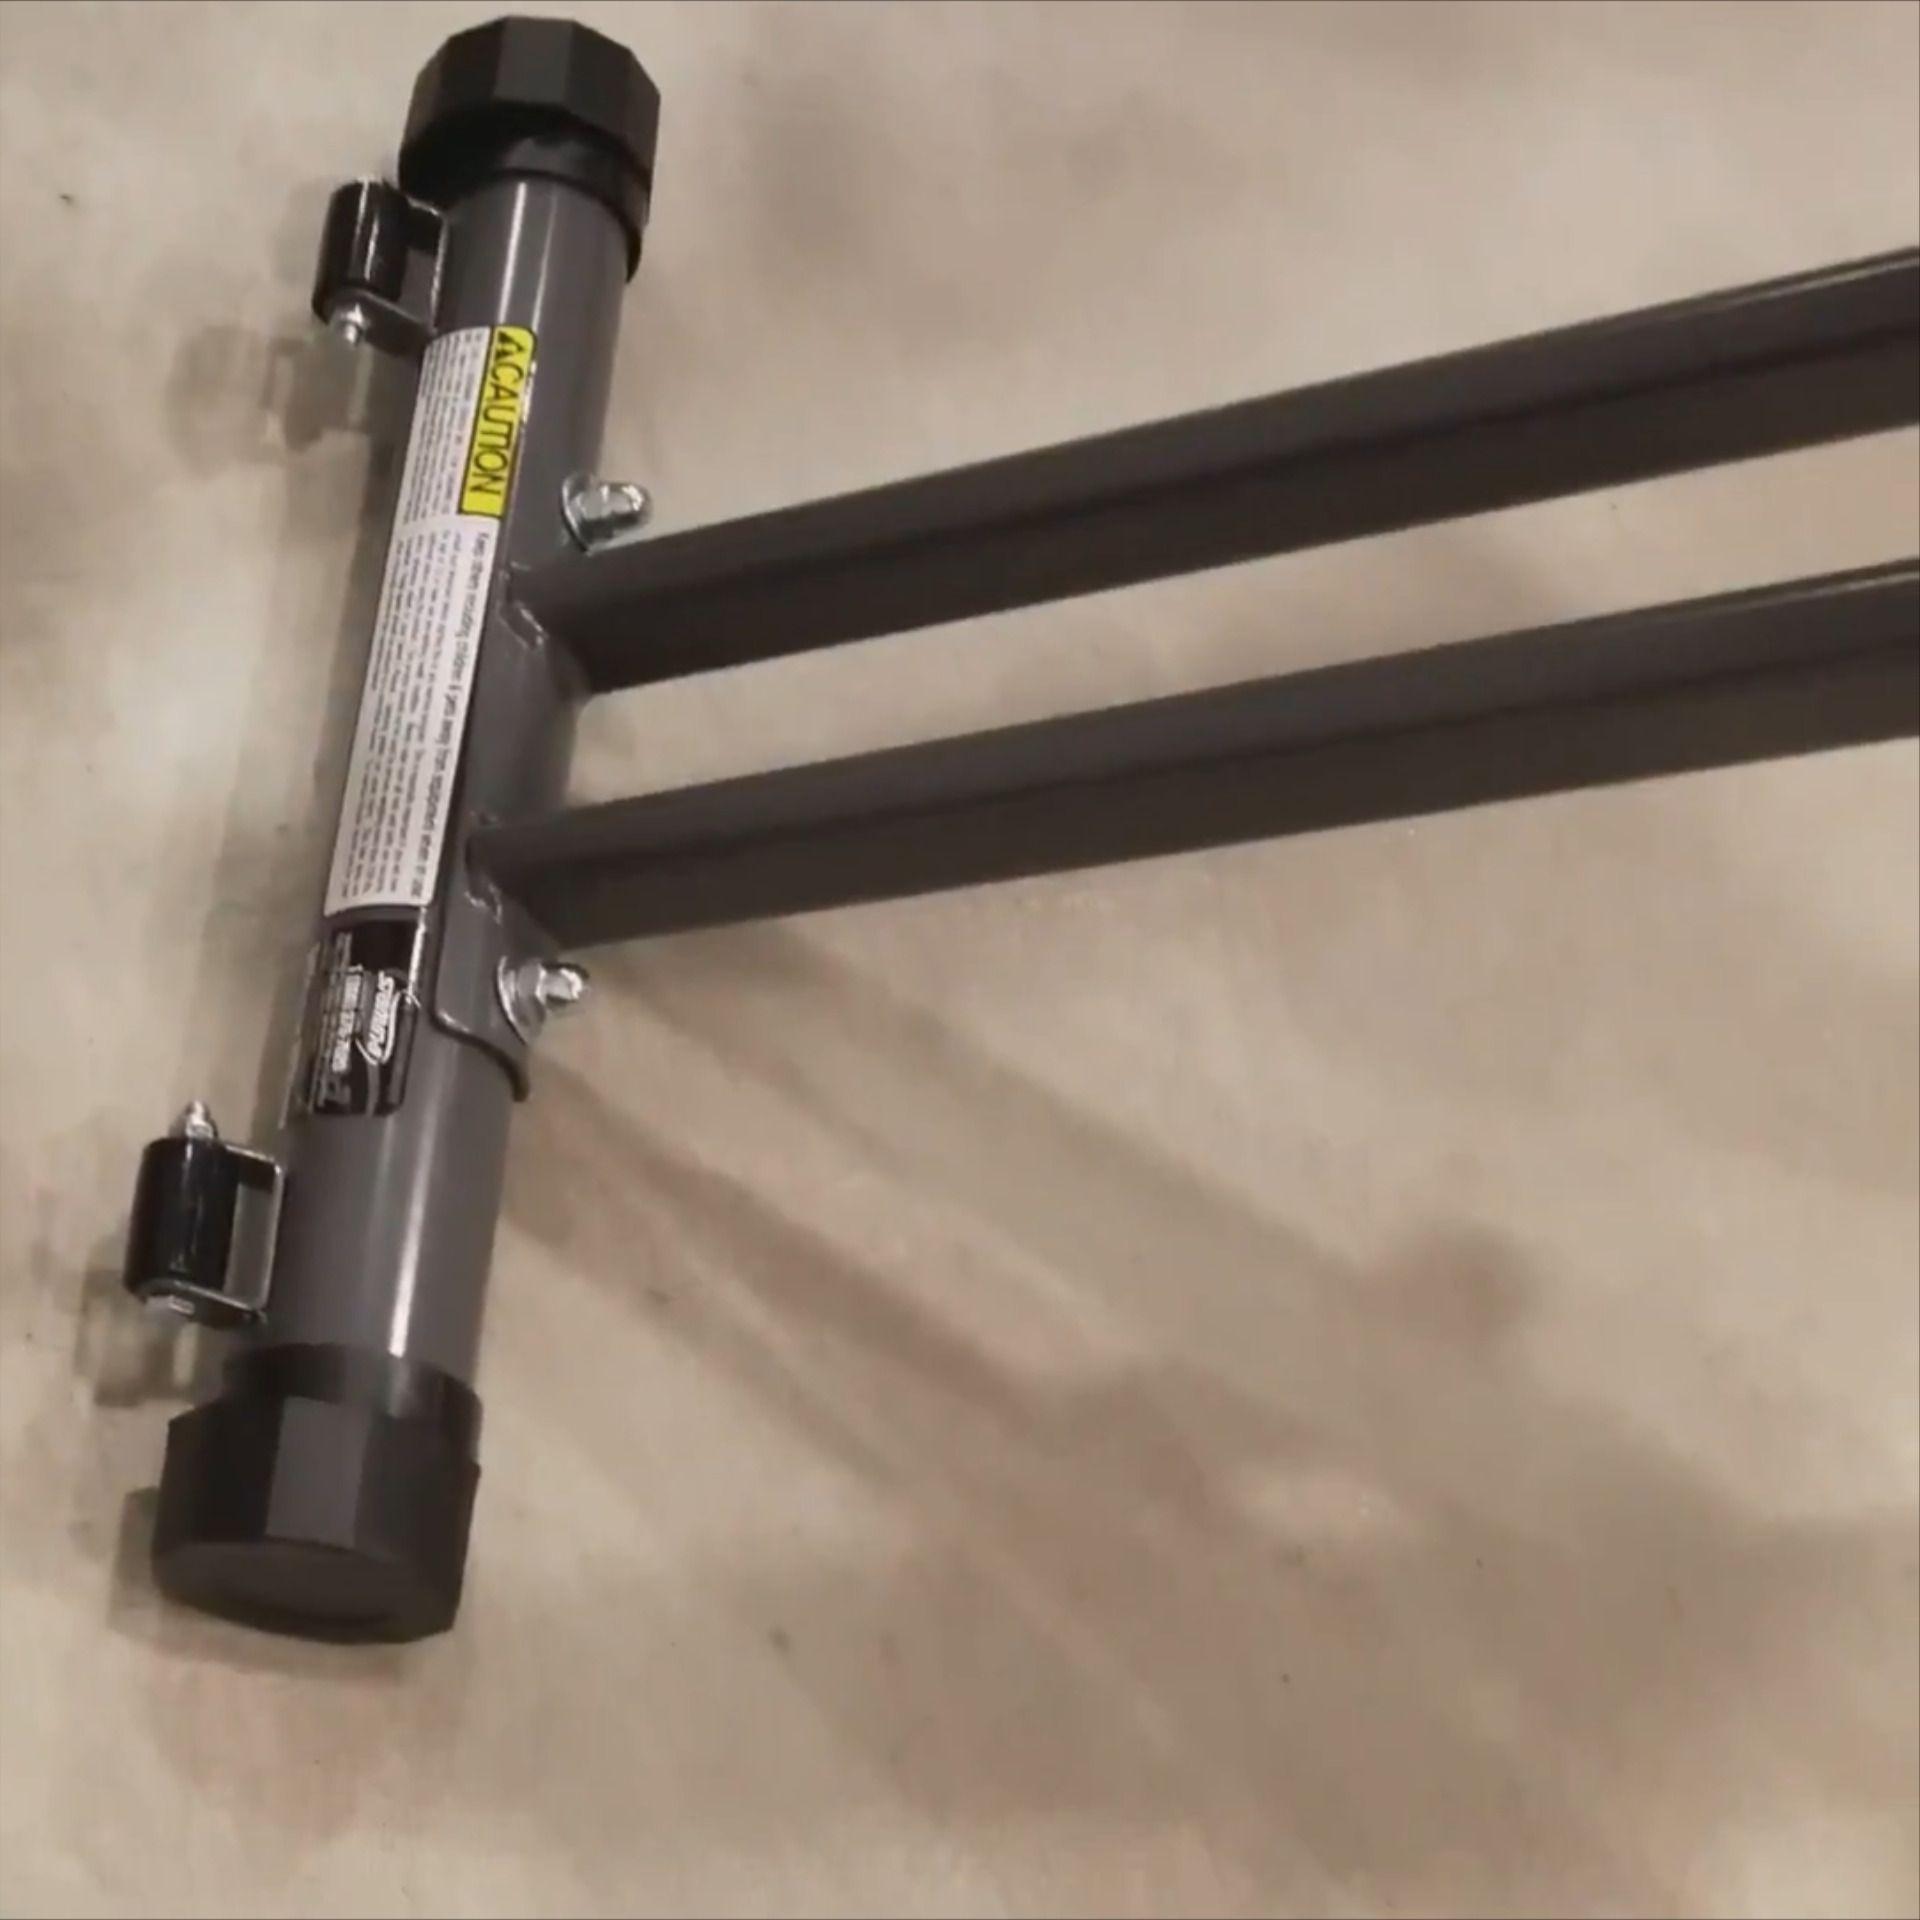 Stamina 890 Stamina Indoor Pro Cycle Stamina 880 Air Resistance